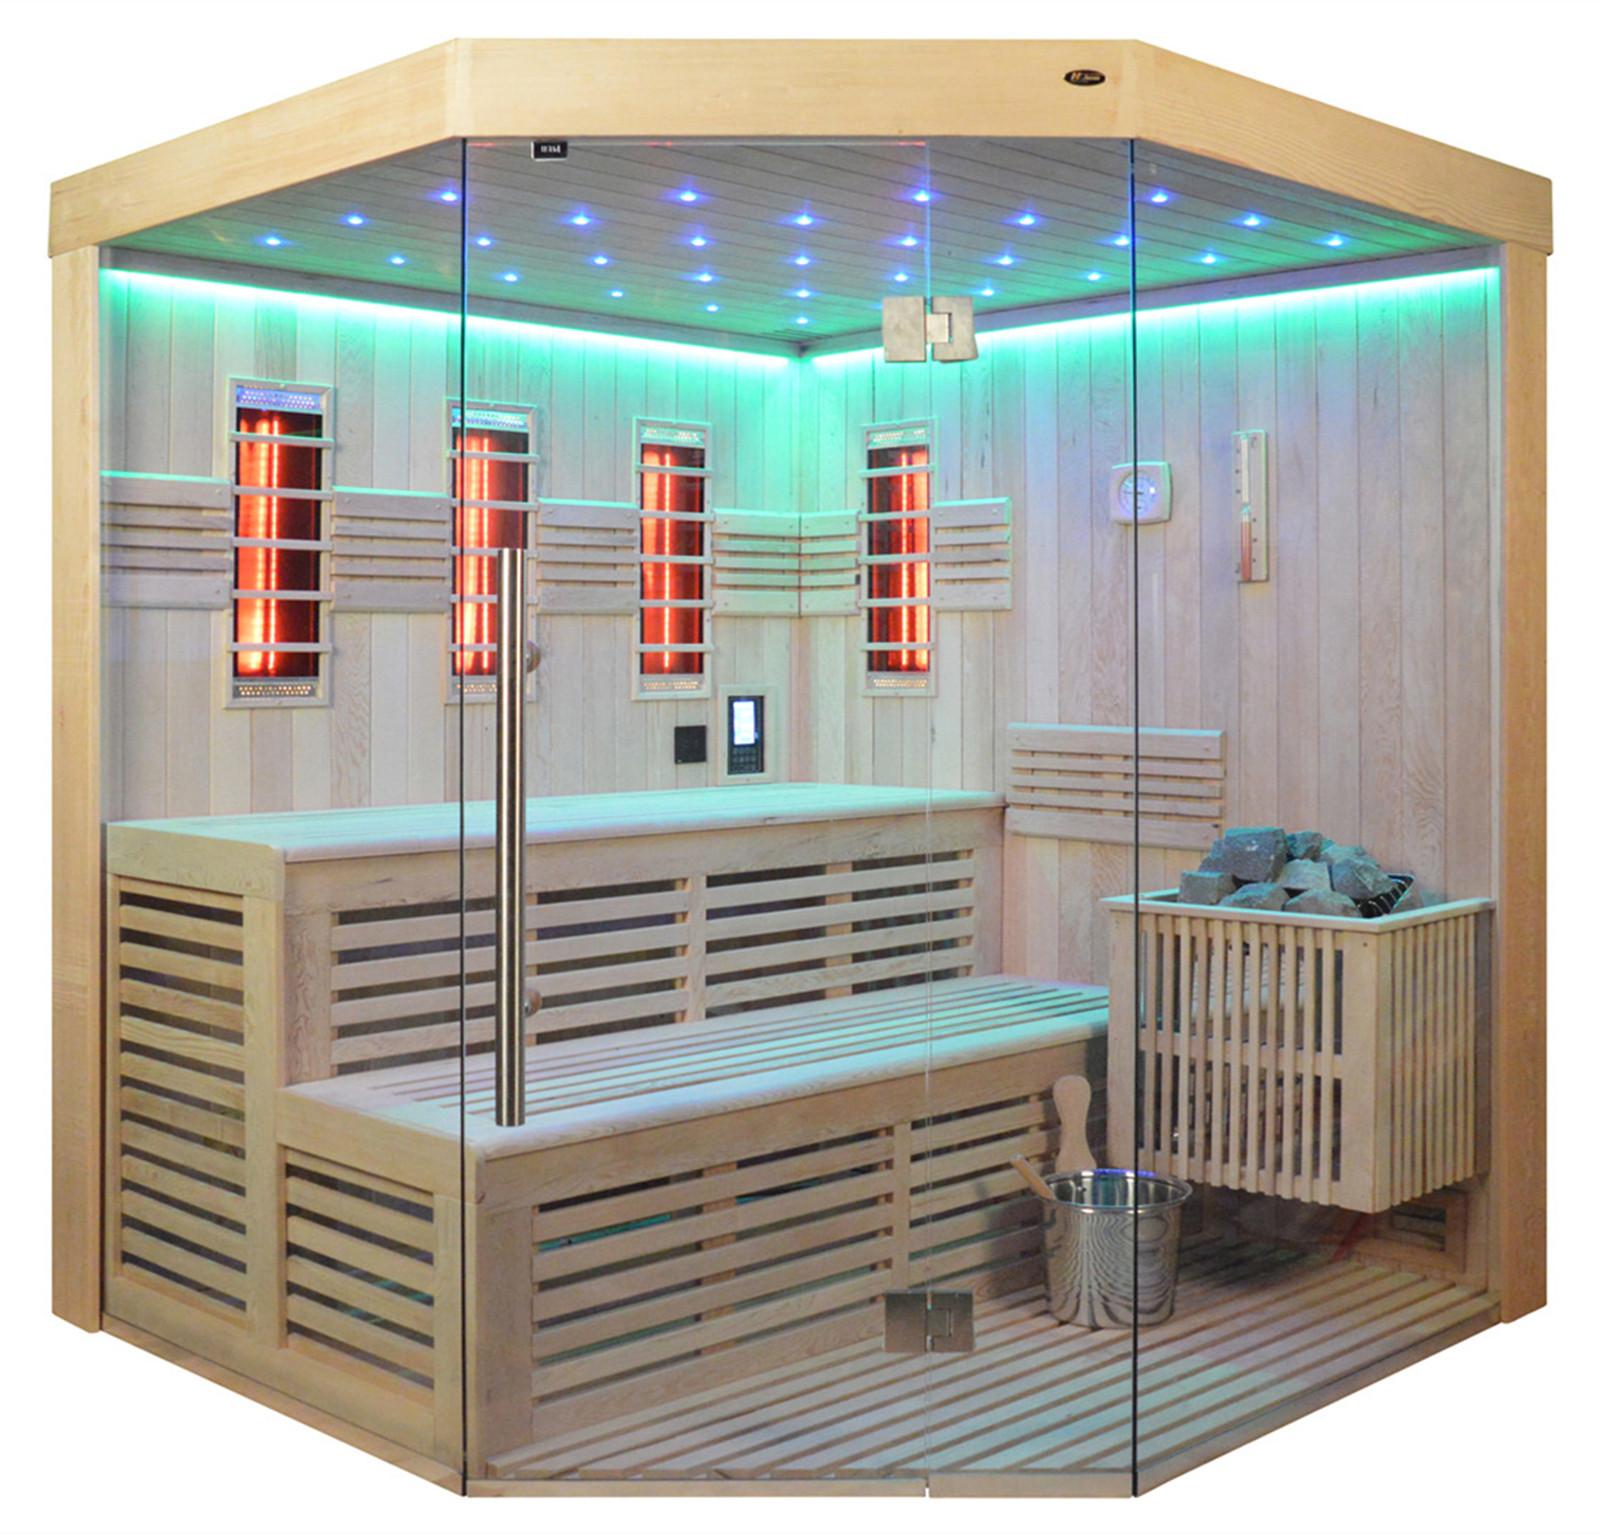 kombisauna ks 4023 bio kombiofen 180x180cm heico wellness design. Black Bedroom Furniture Sets. Home Design Ideas